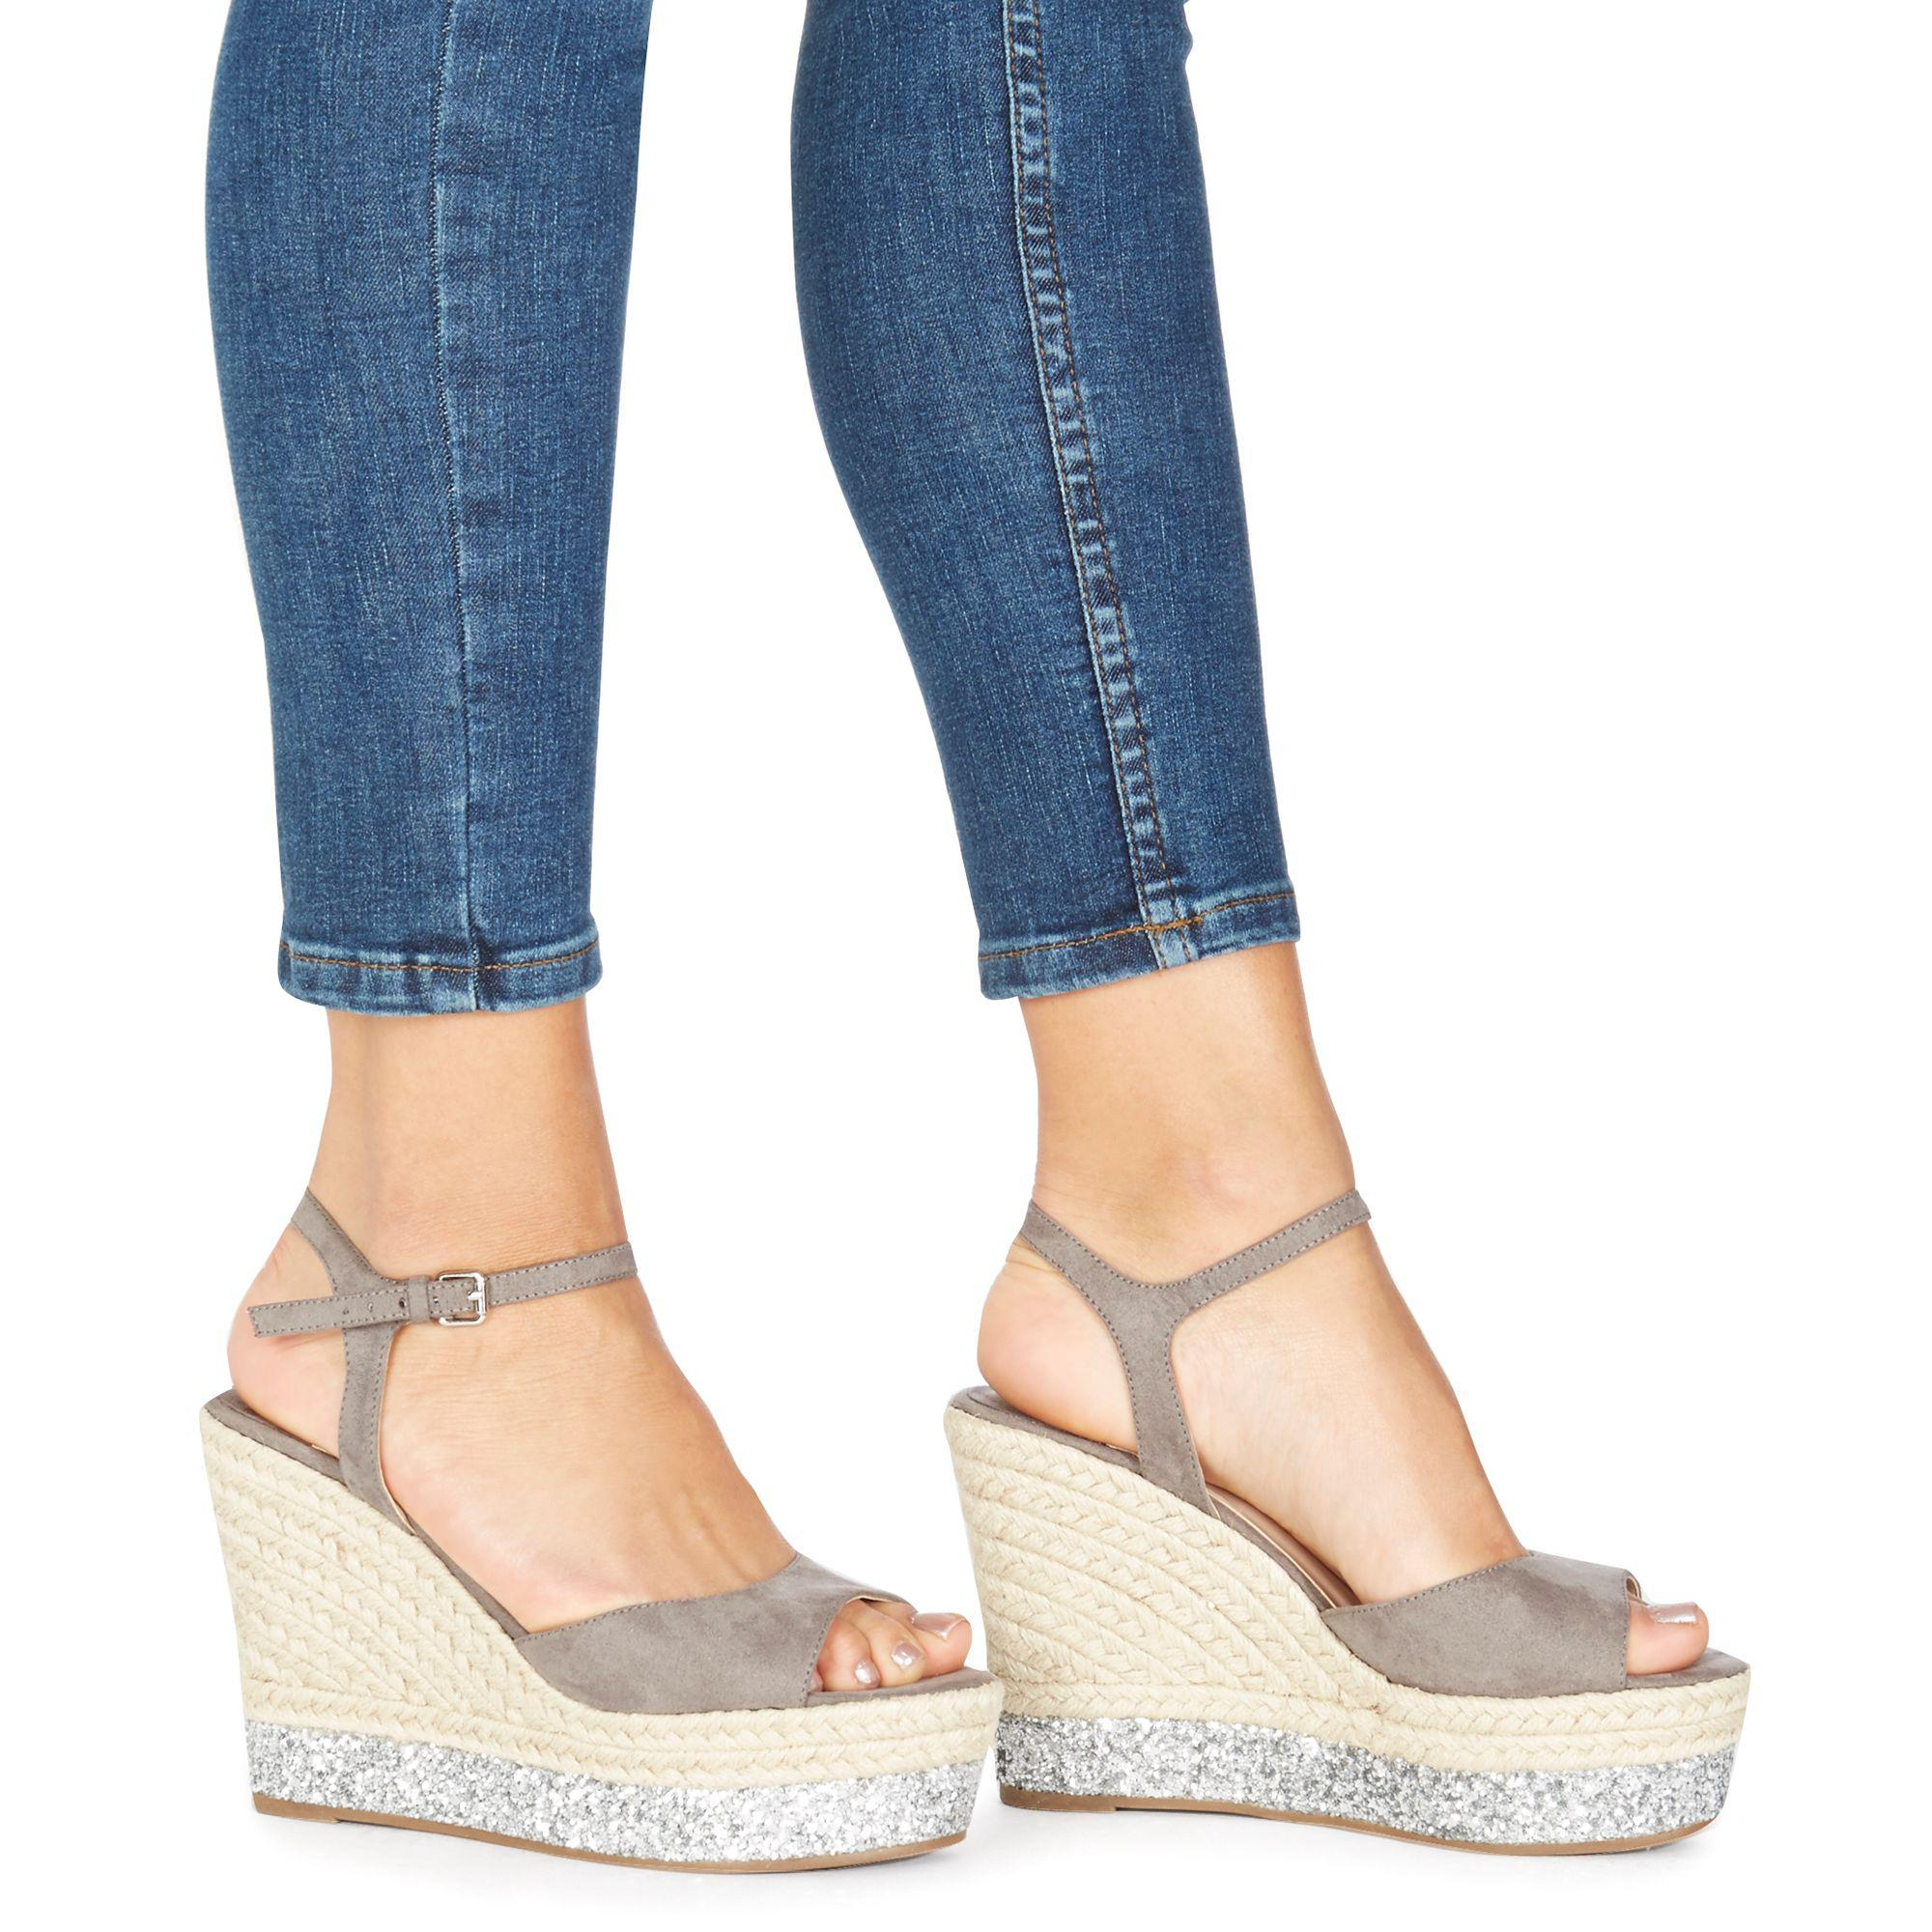 3c8934b8736 Faith Grey 'liddy' High Wedge Heel Ankle Strap Sandals in Gray - Lyst